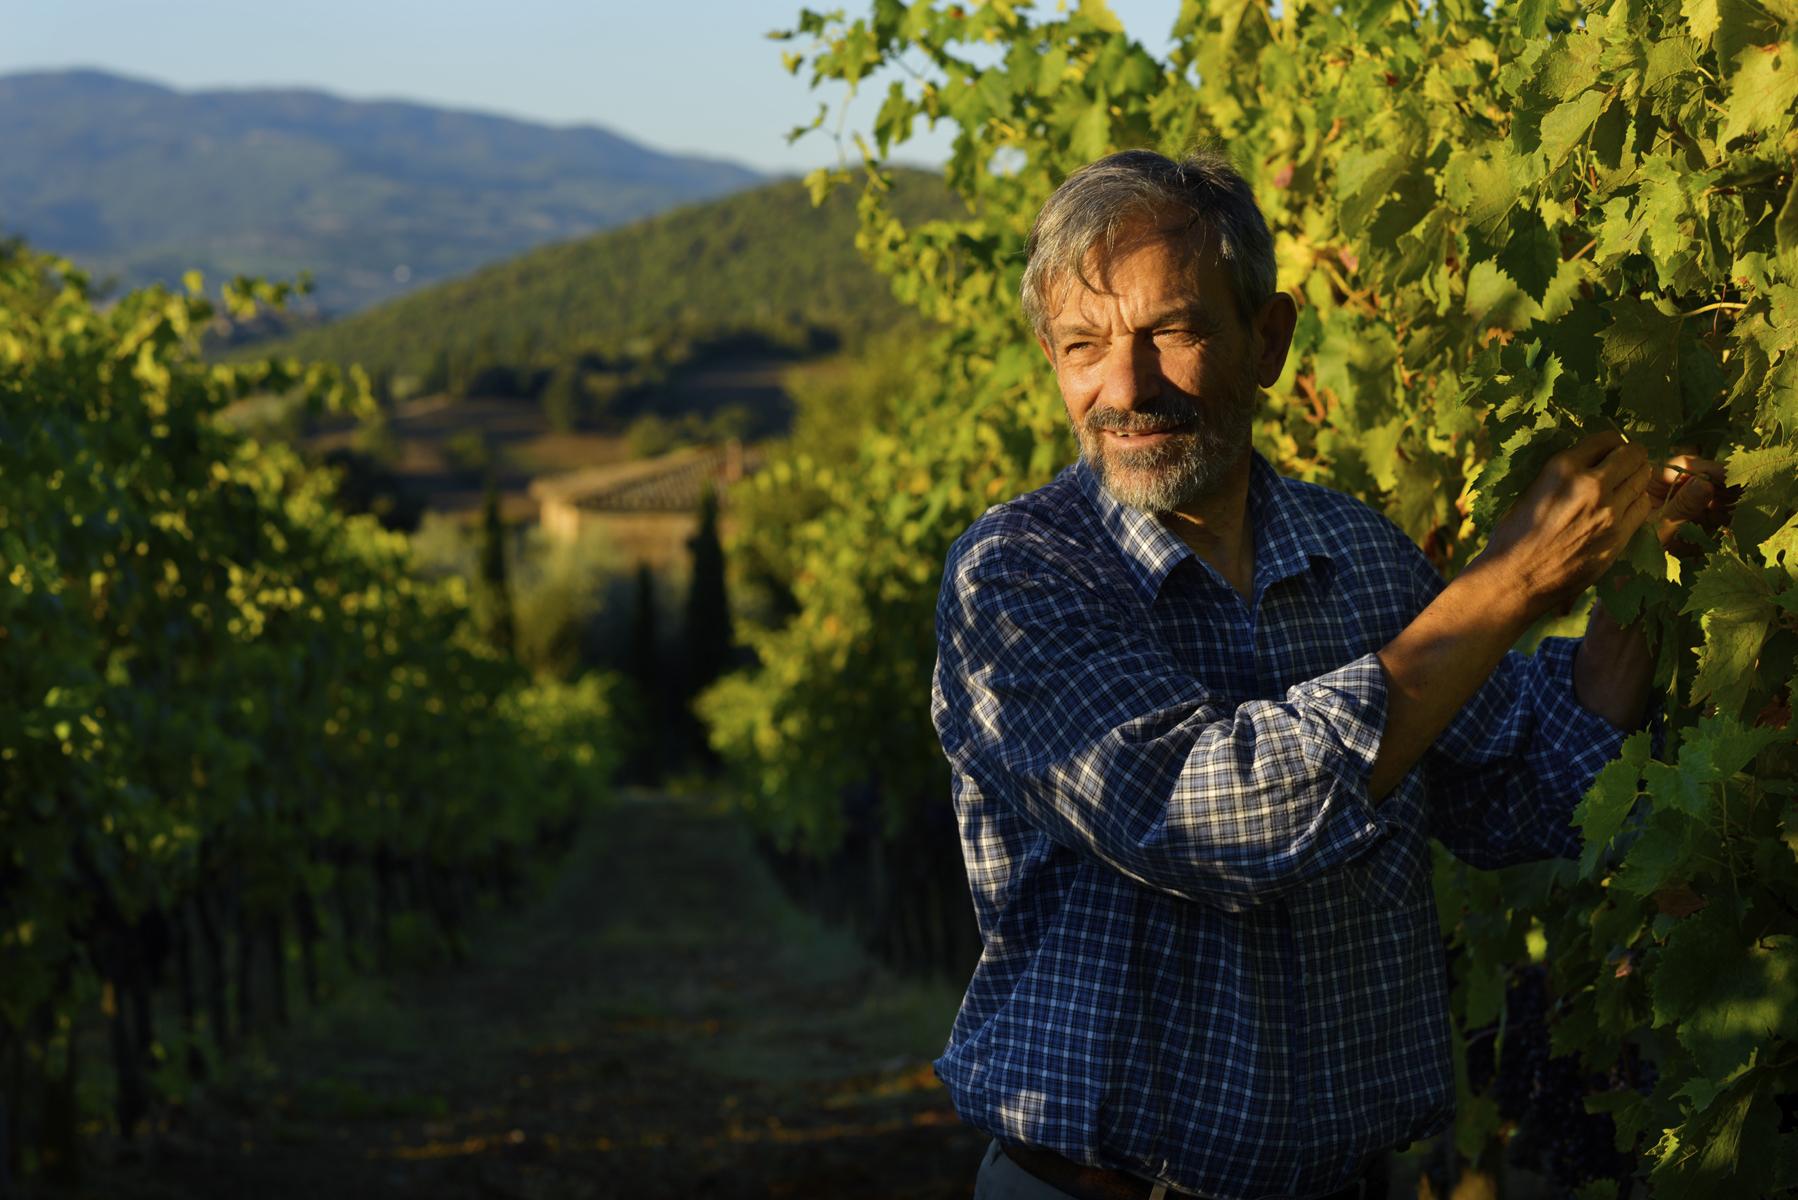 Winegrower Sergio Gargari harvesting grapes in his vineyard Pieve de Pitti, Terricciola, wine region Colline Pisane, Tuscany, Italy.